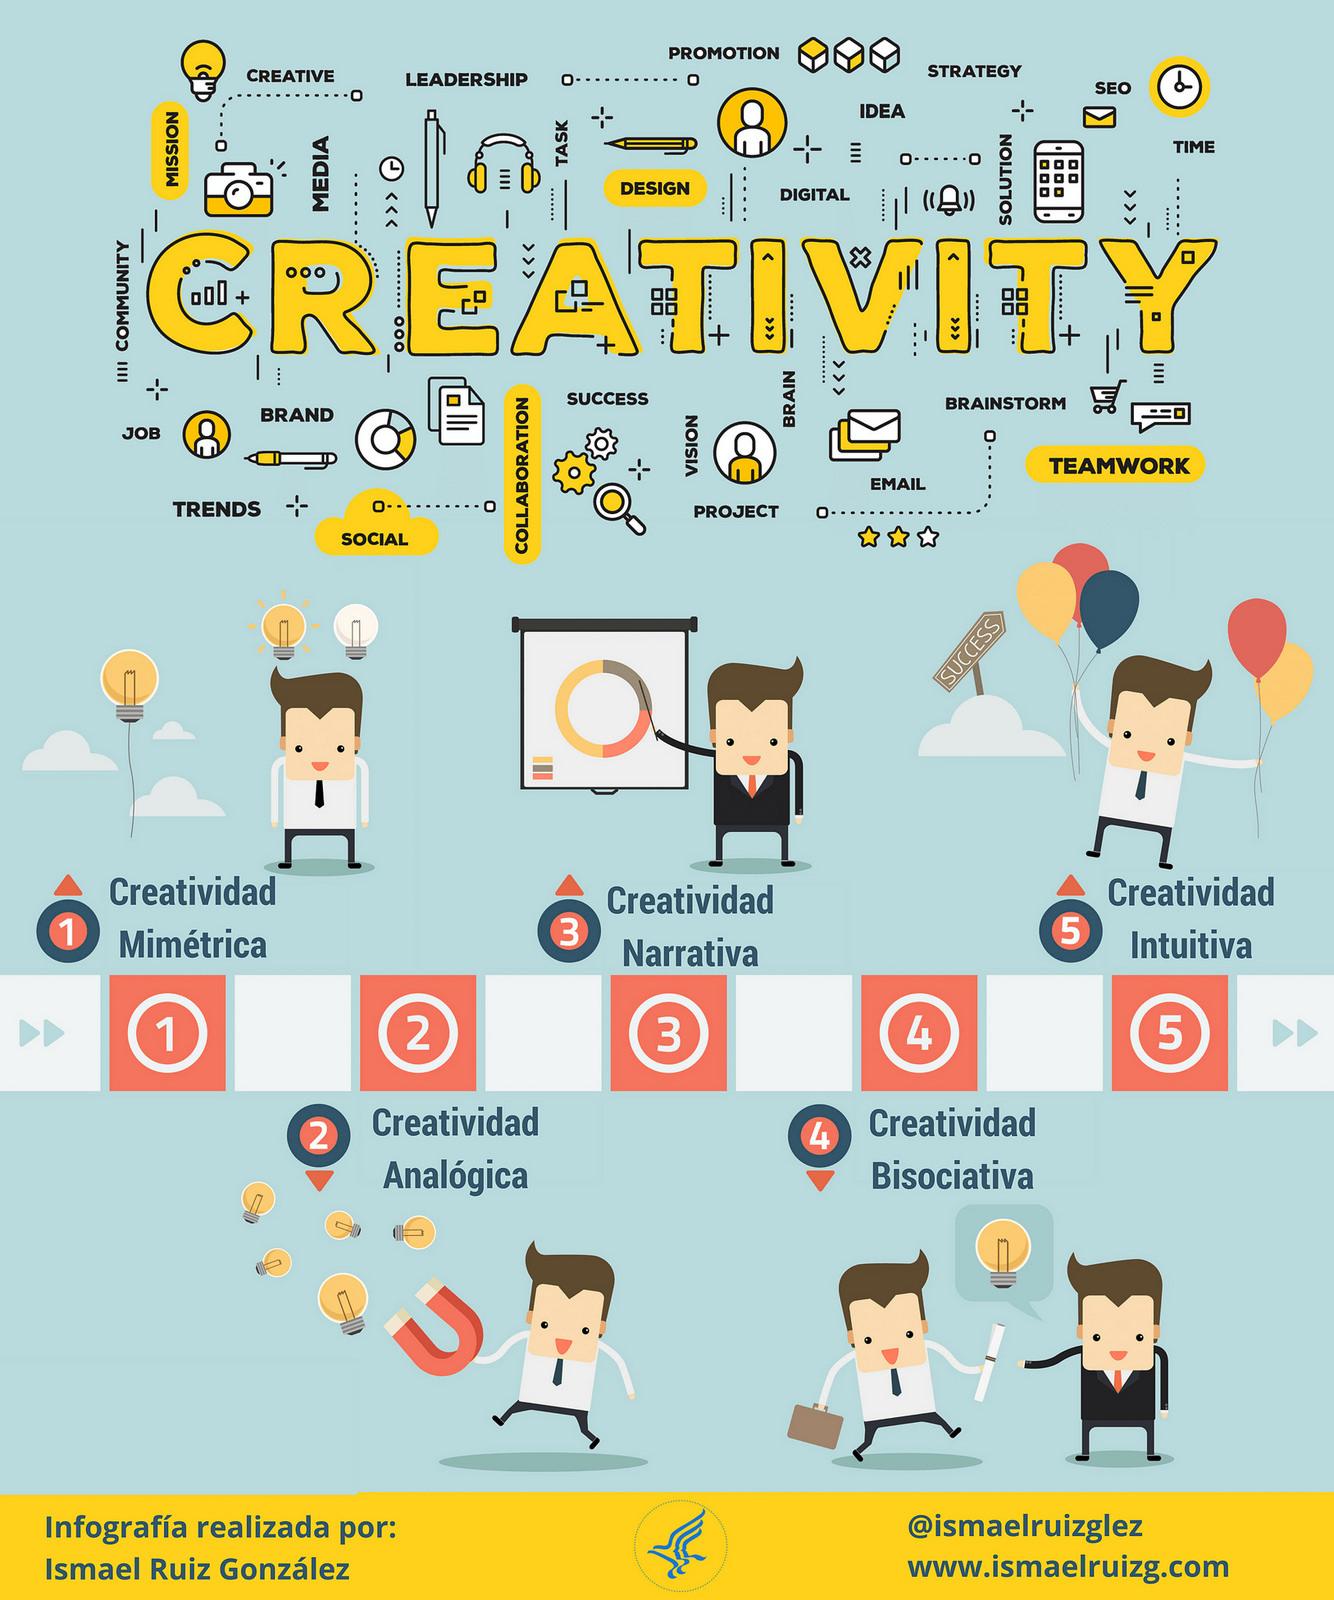 Media Confidential 2017 09 10: Tipos De Creatividad #infografia #infographic